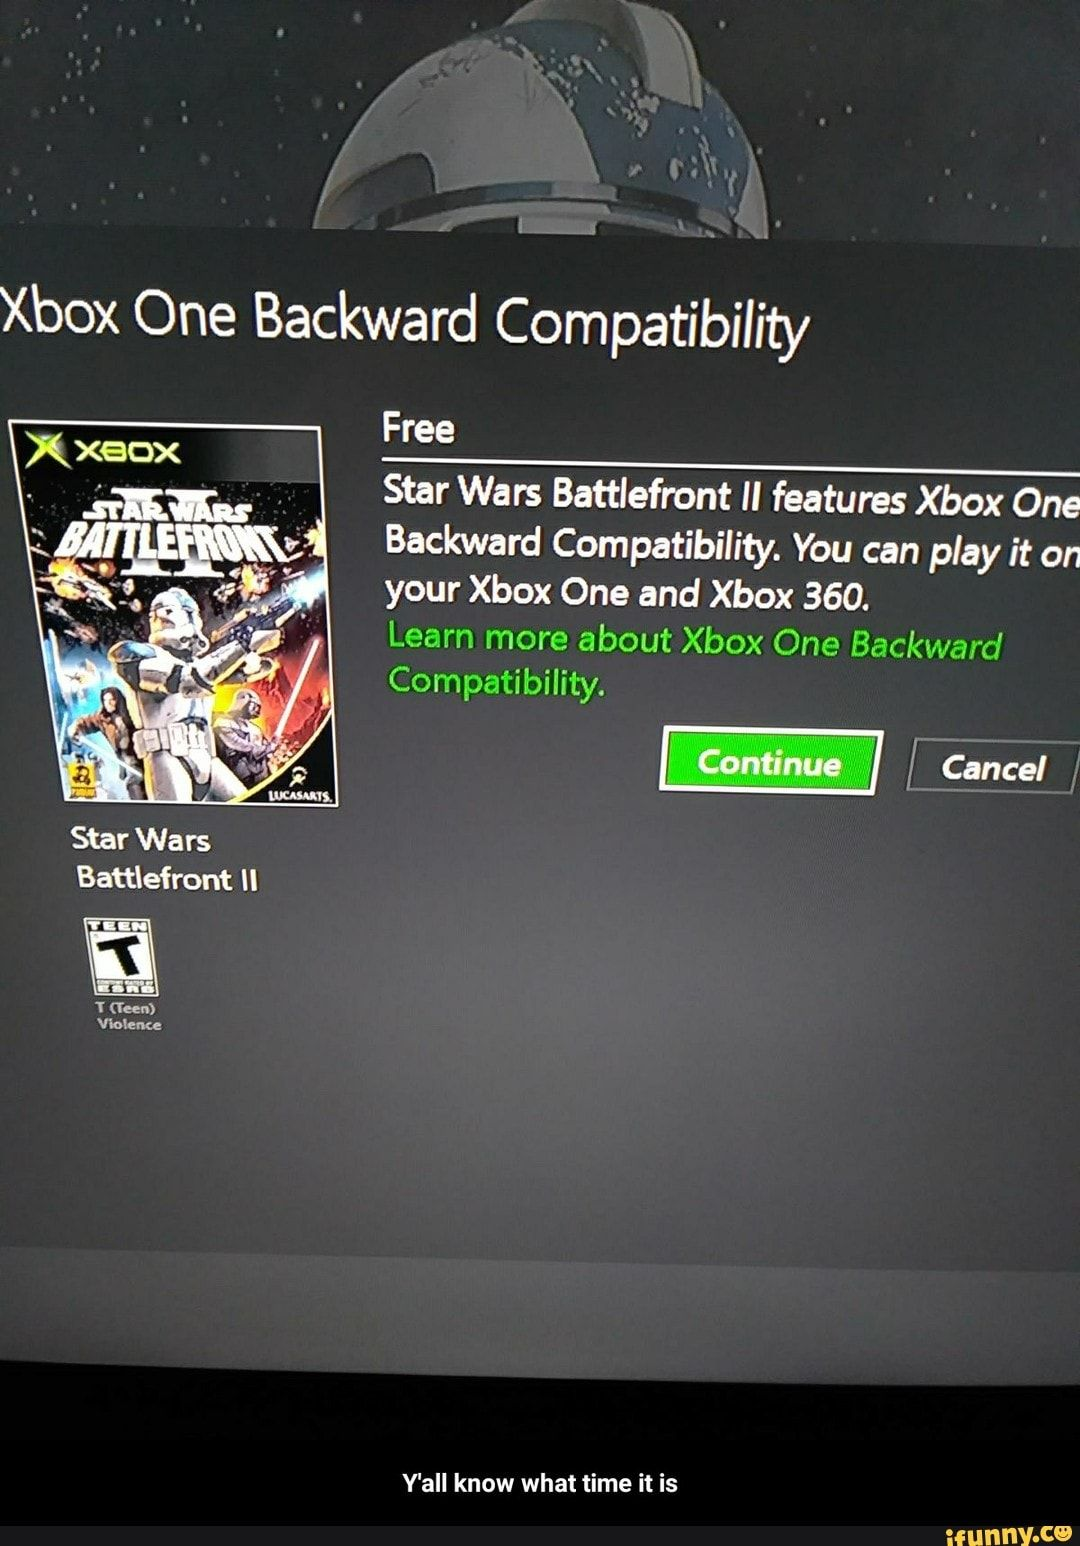 Xbox One Backward Compatibility Free & Star Wars Battlefront